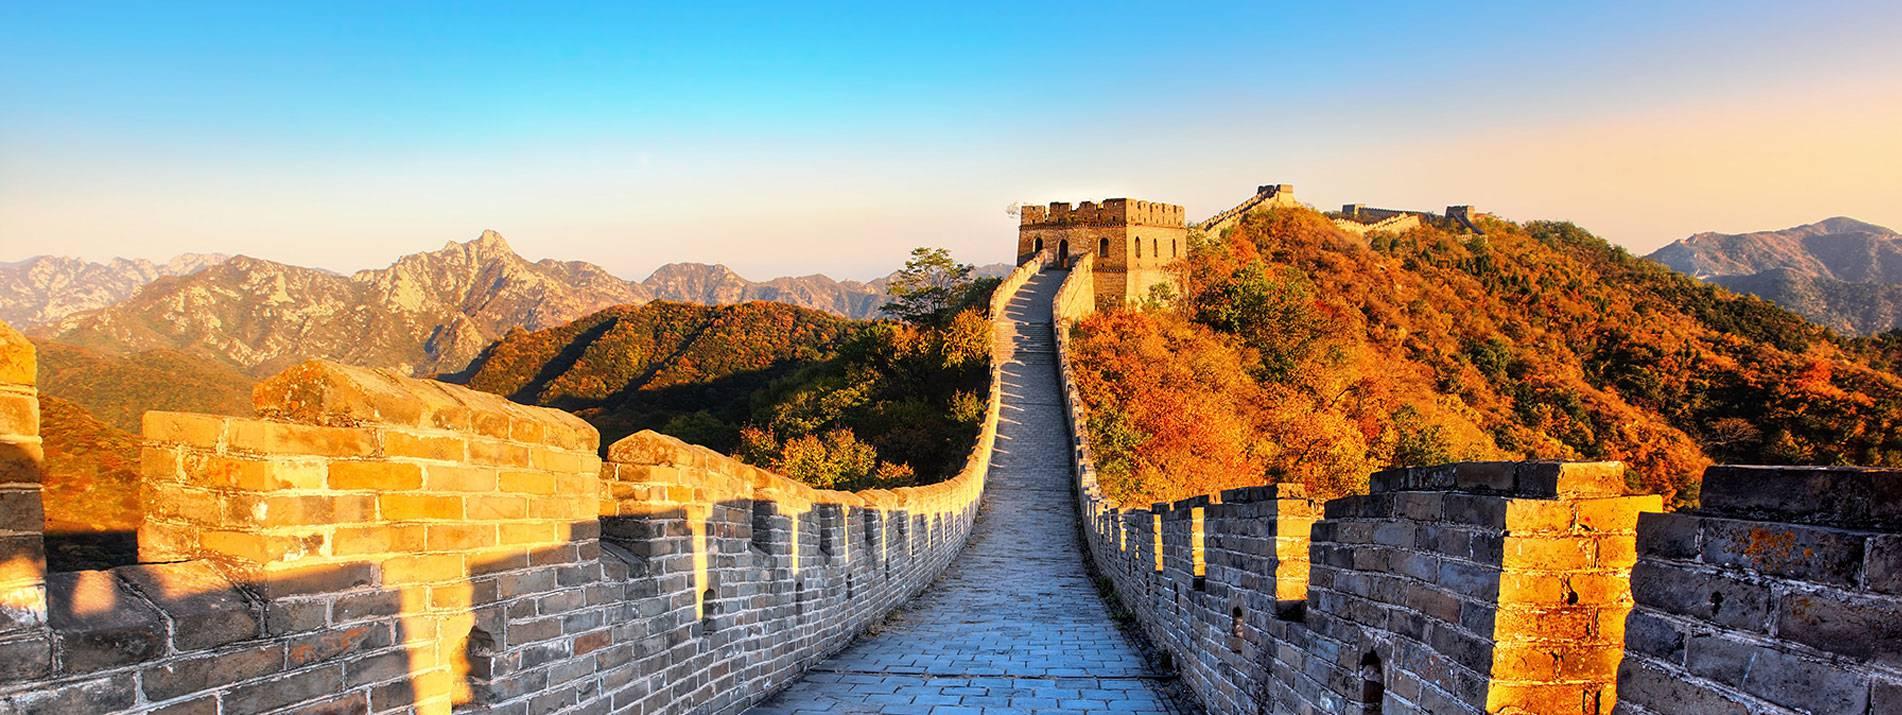 La Grande Muralia Cinese